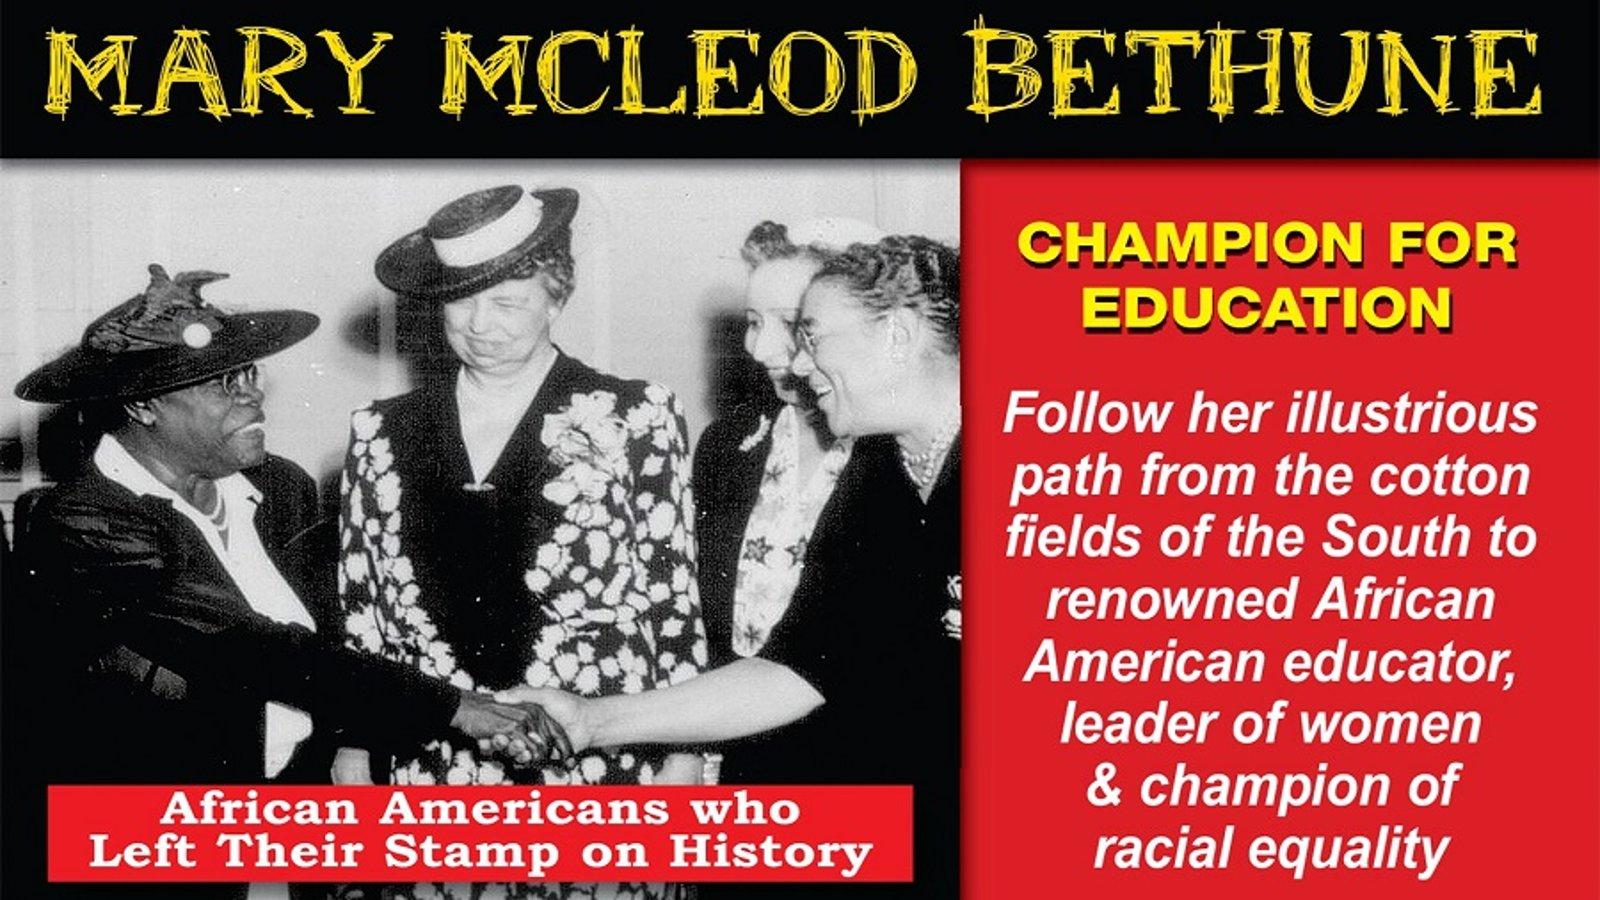 Mary McLeod Bethune: Champion For Education